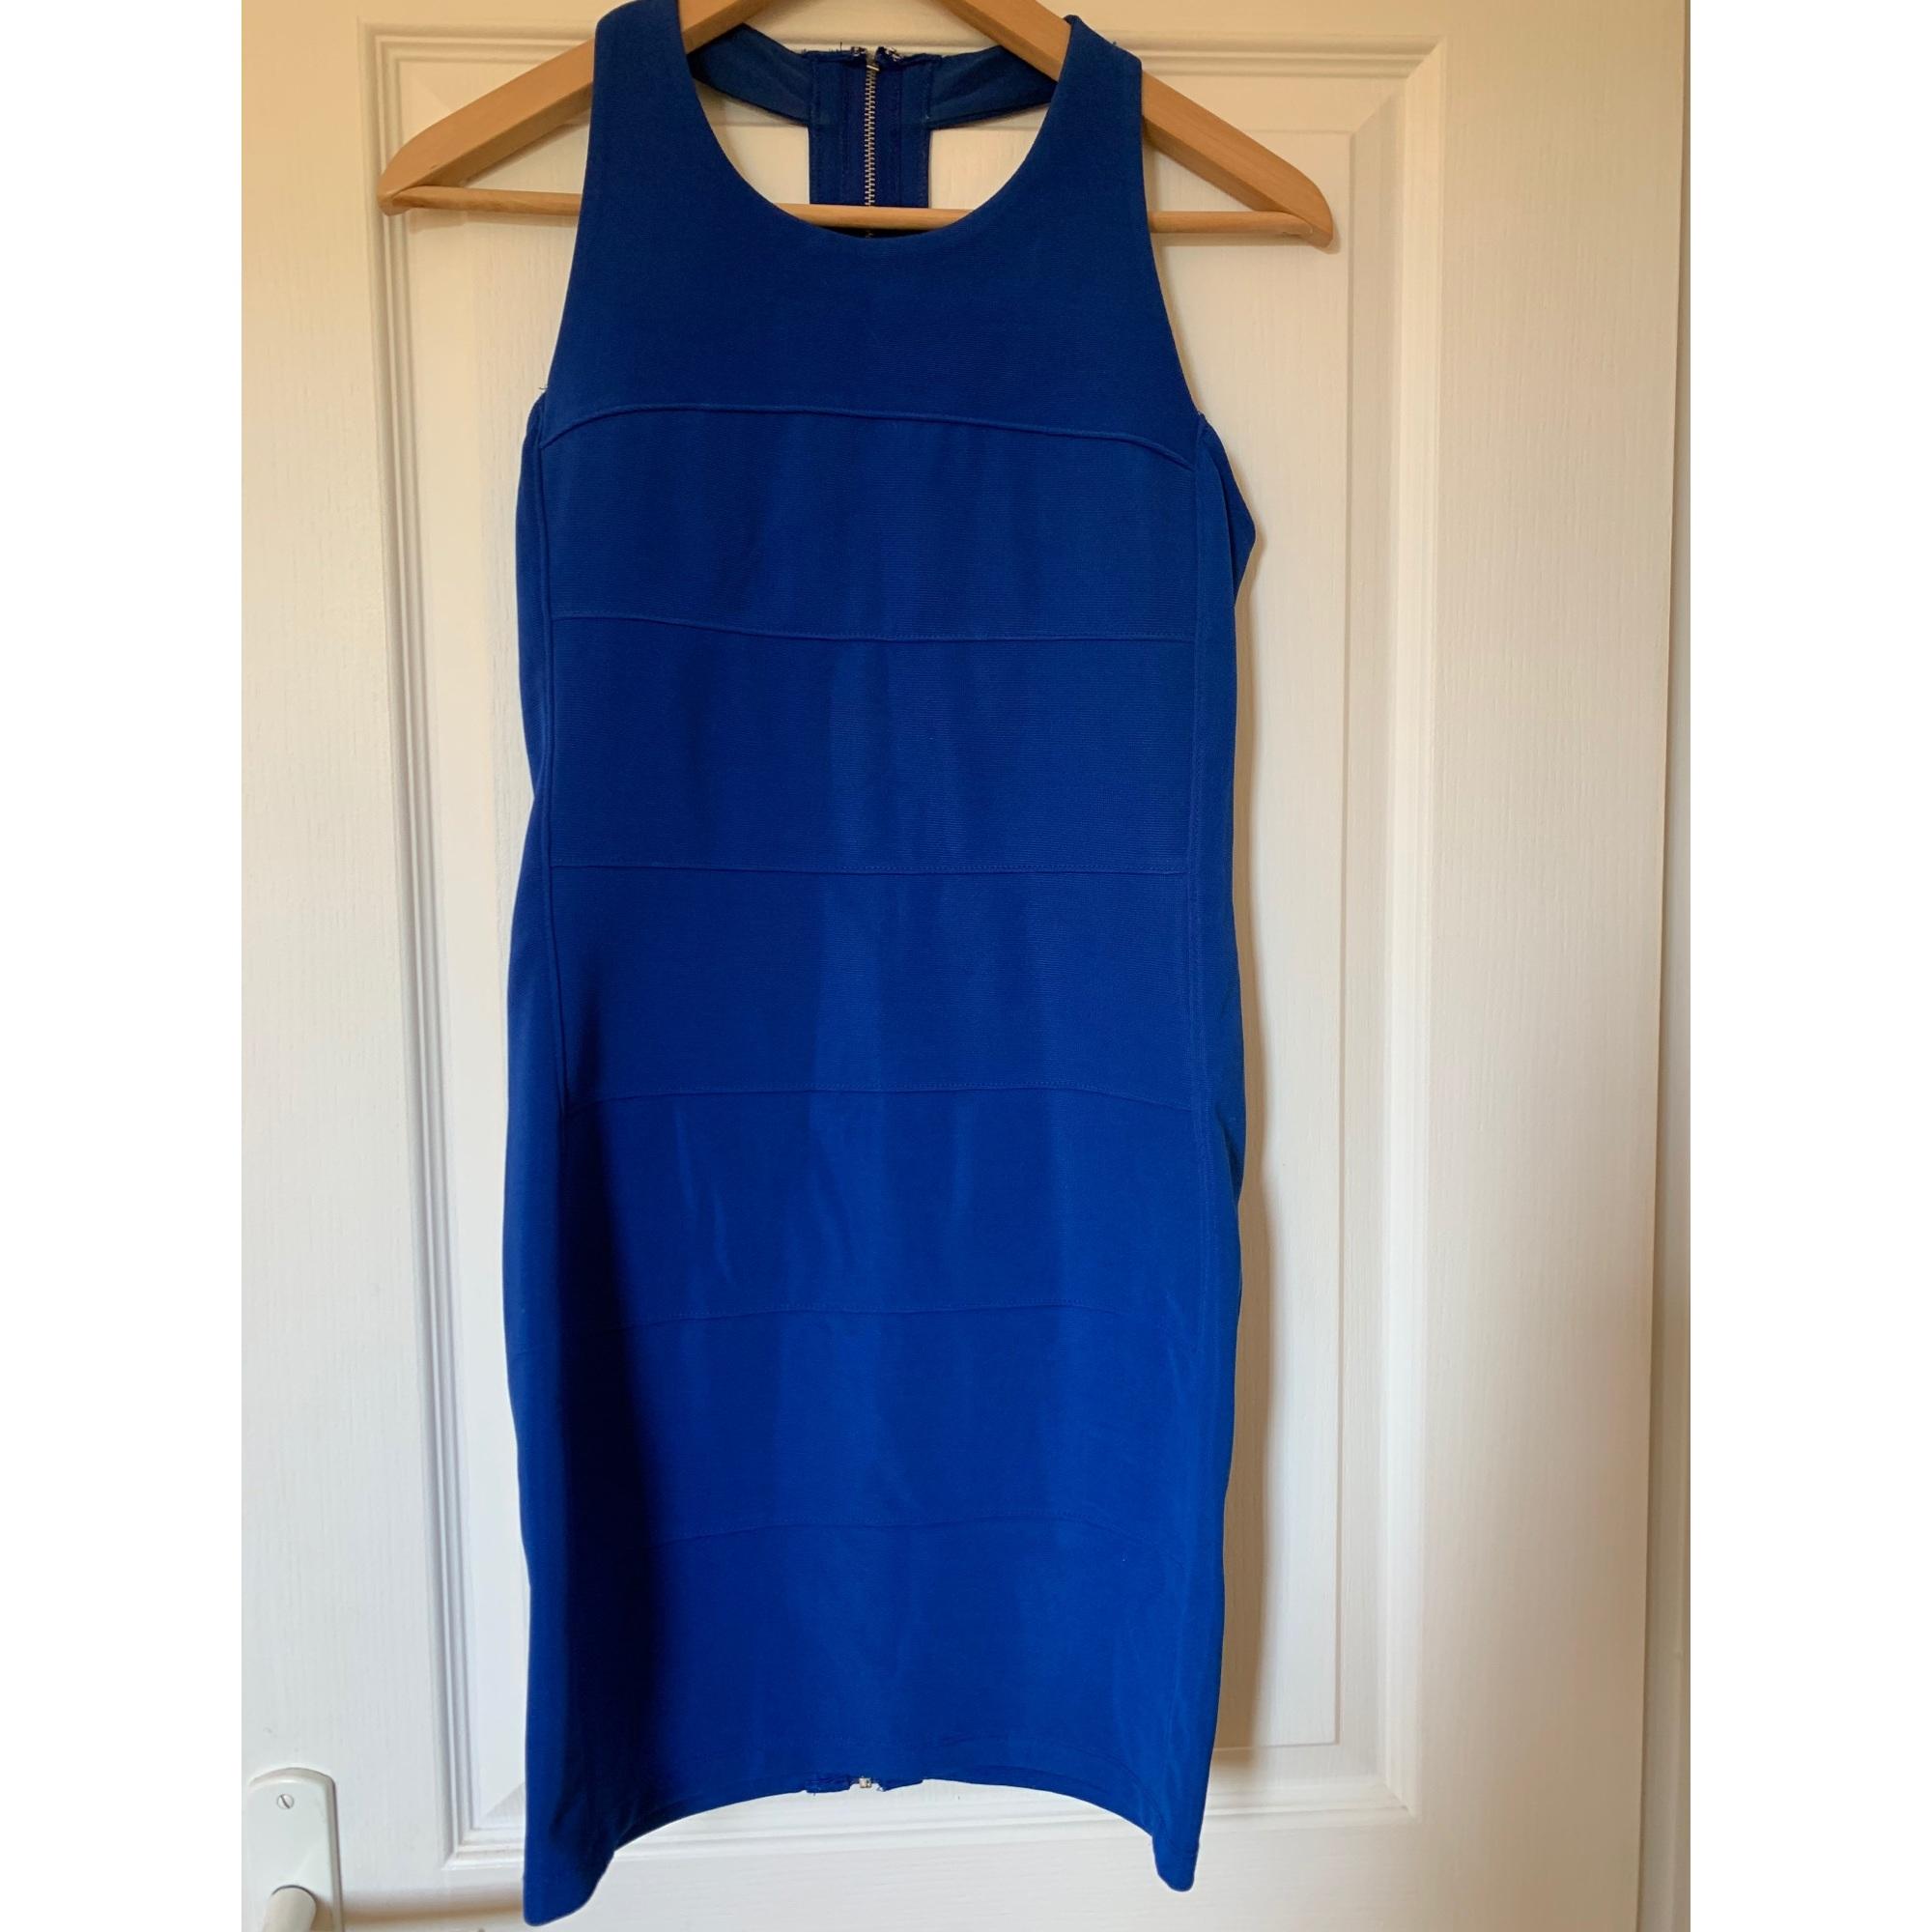 Robe courte FOREVER 21 Bleu, bleu marine, bleu turquoise